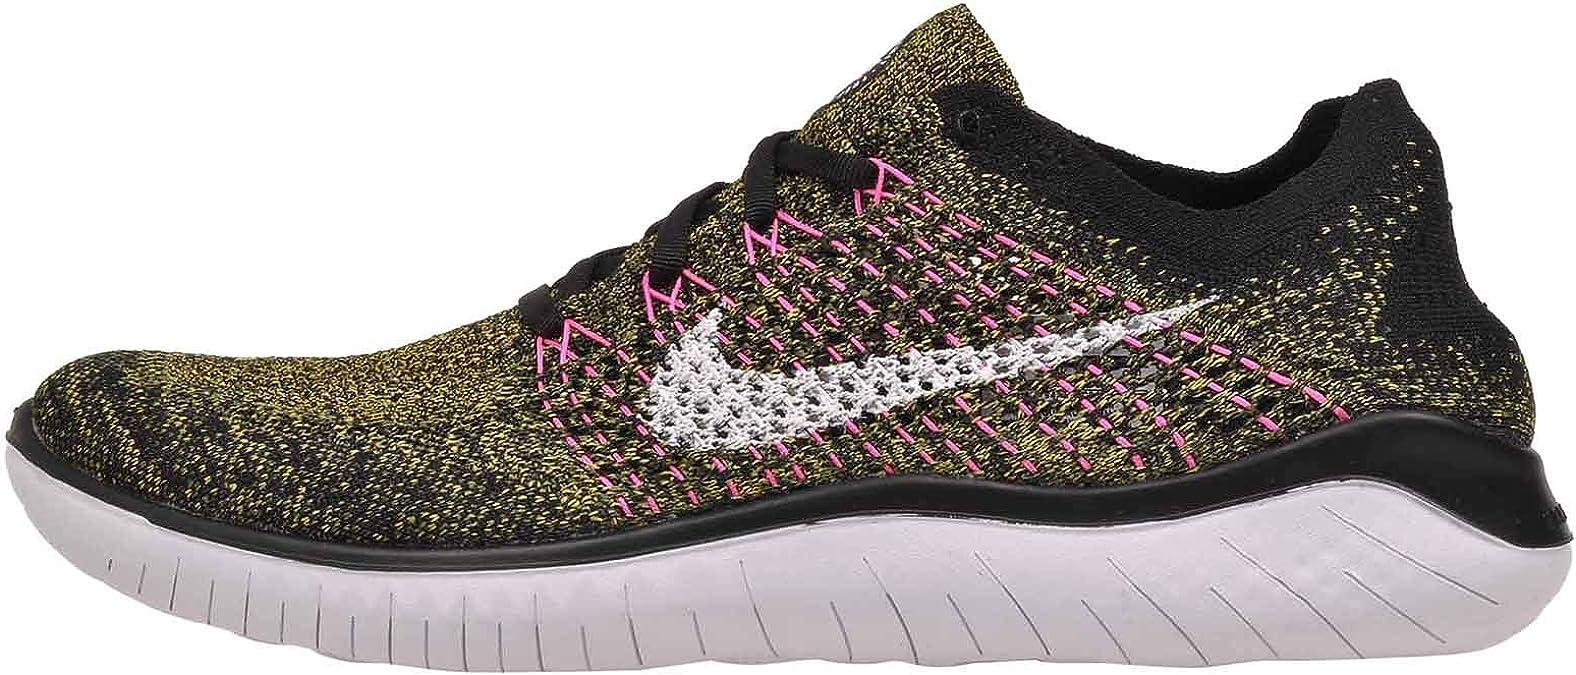 Nike Mens Free RN Flyknit Running Shoe: Amazon.es: Zapatos y complementos